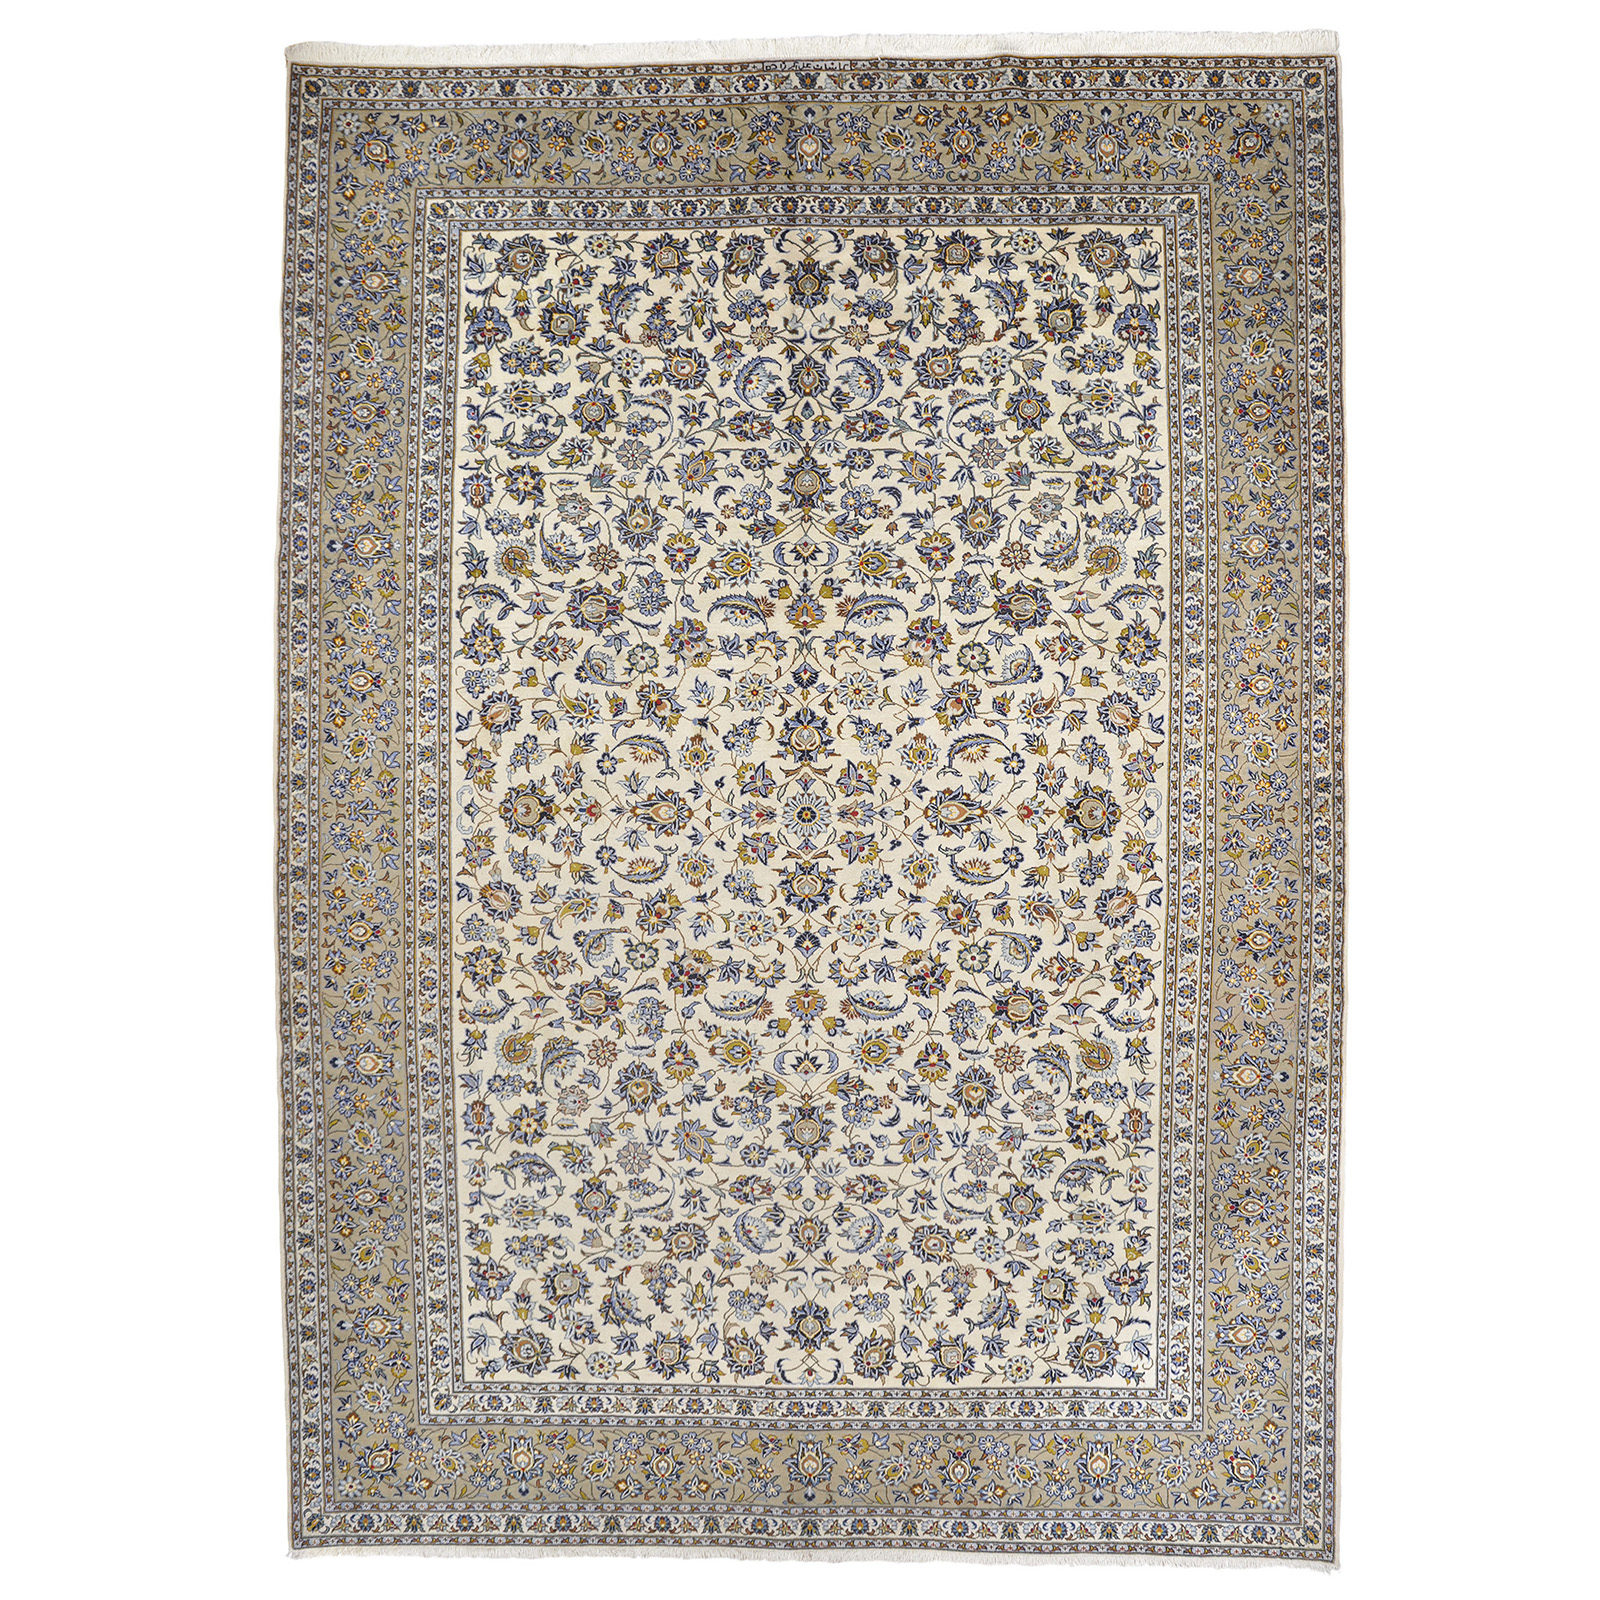 Kashan matta storlek 432x308 cm